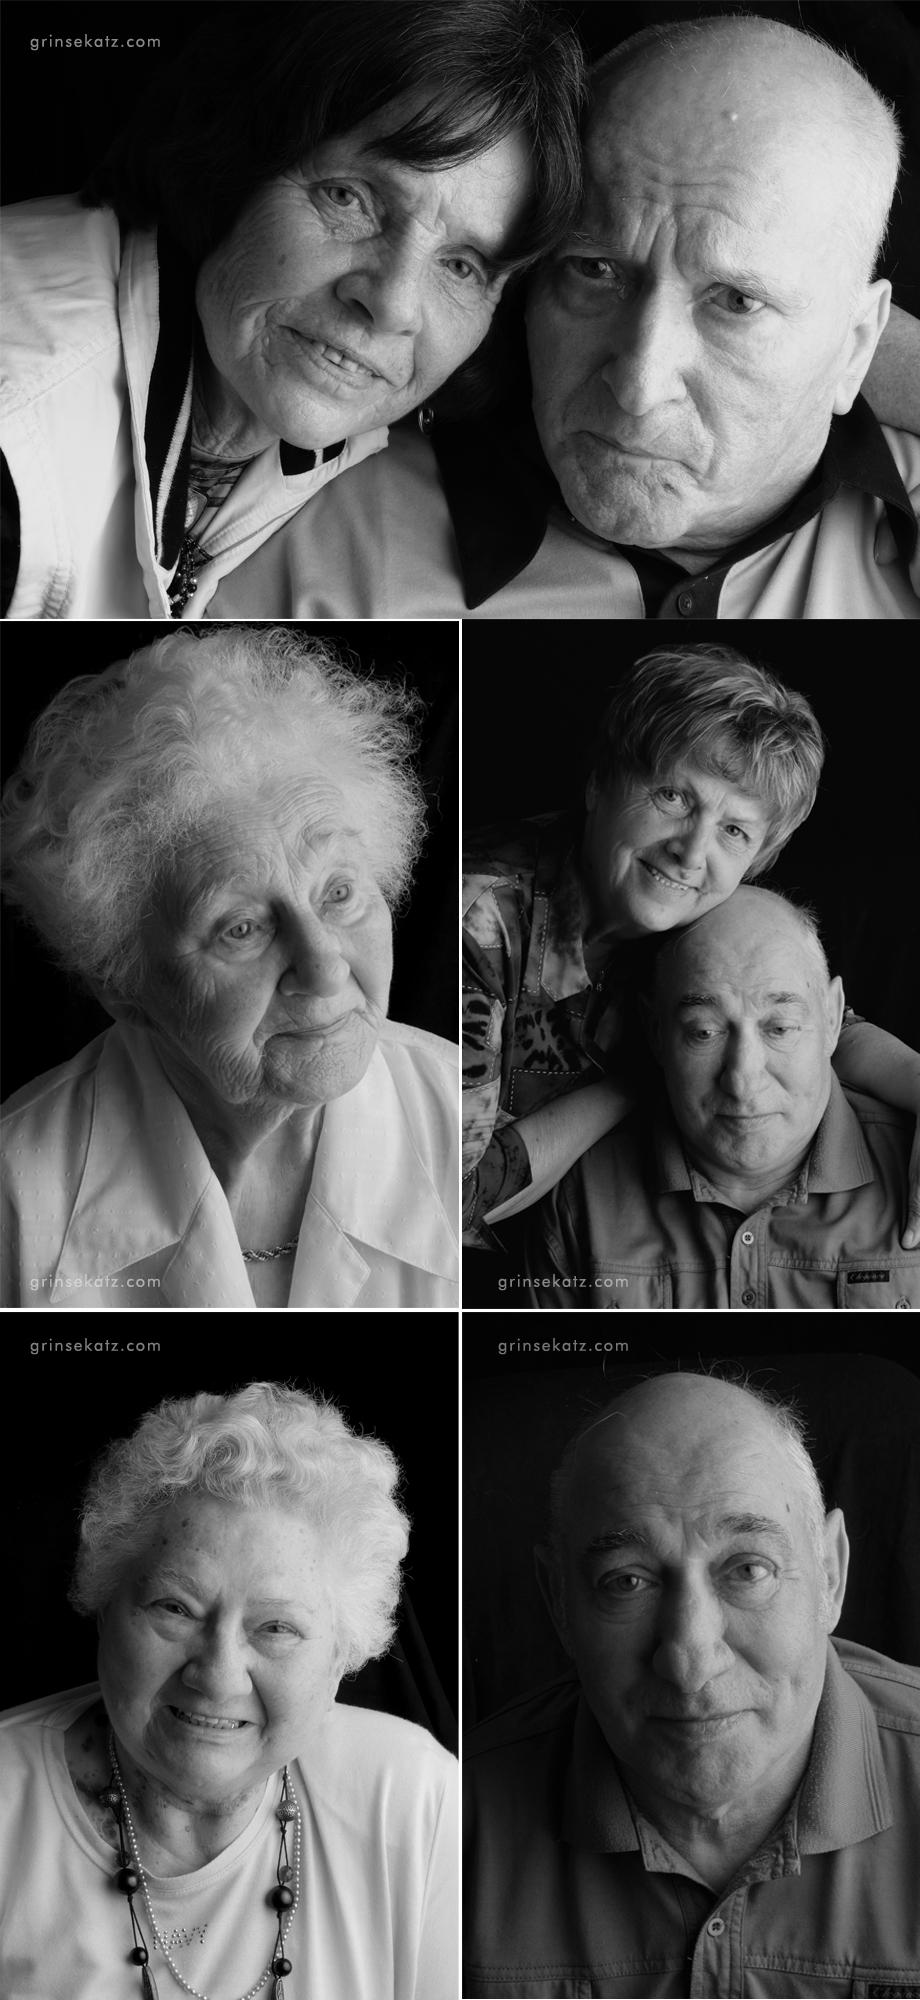 seniorenportrait uckermark grinsekatz fotohaus